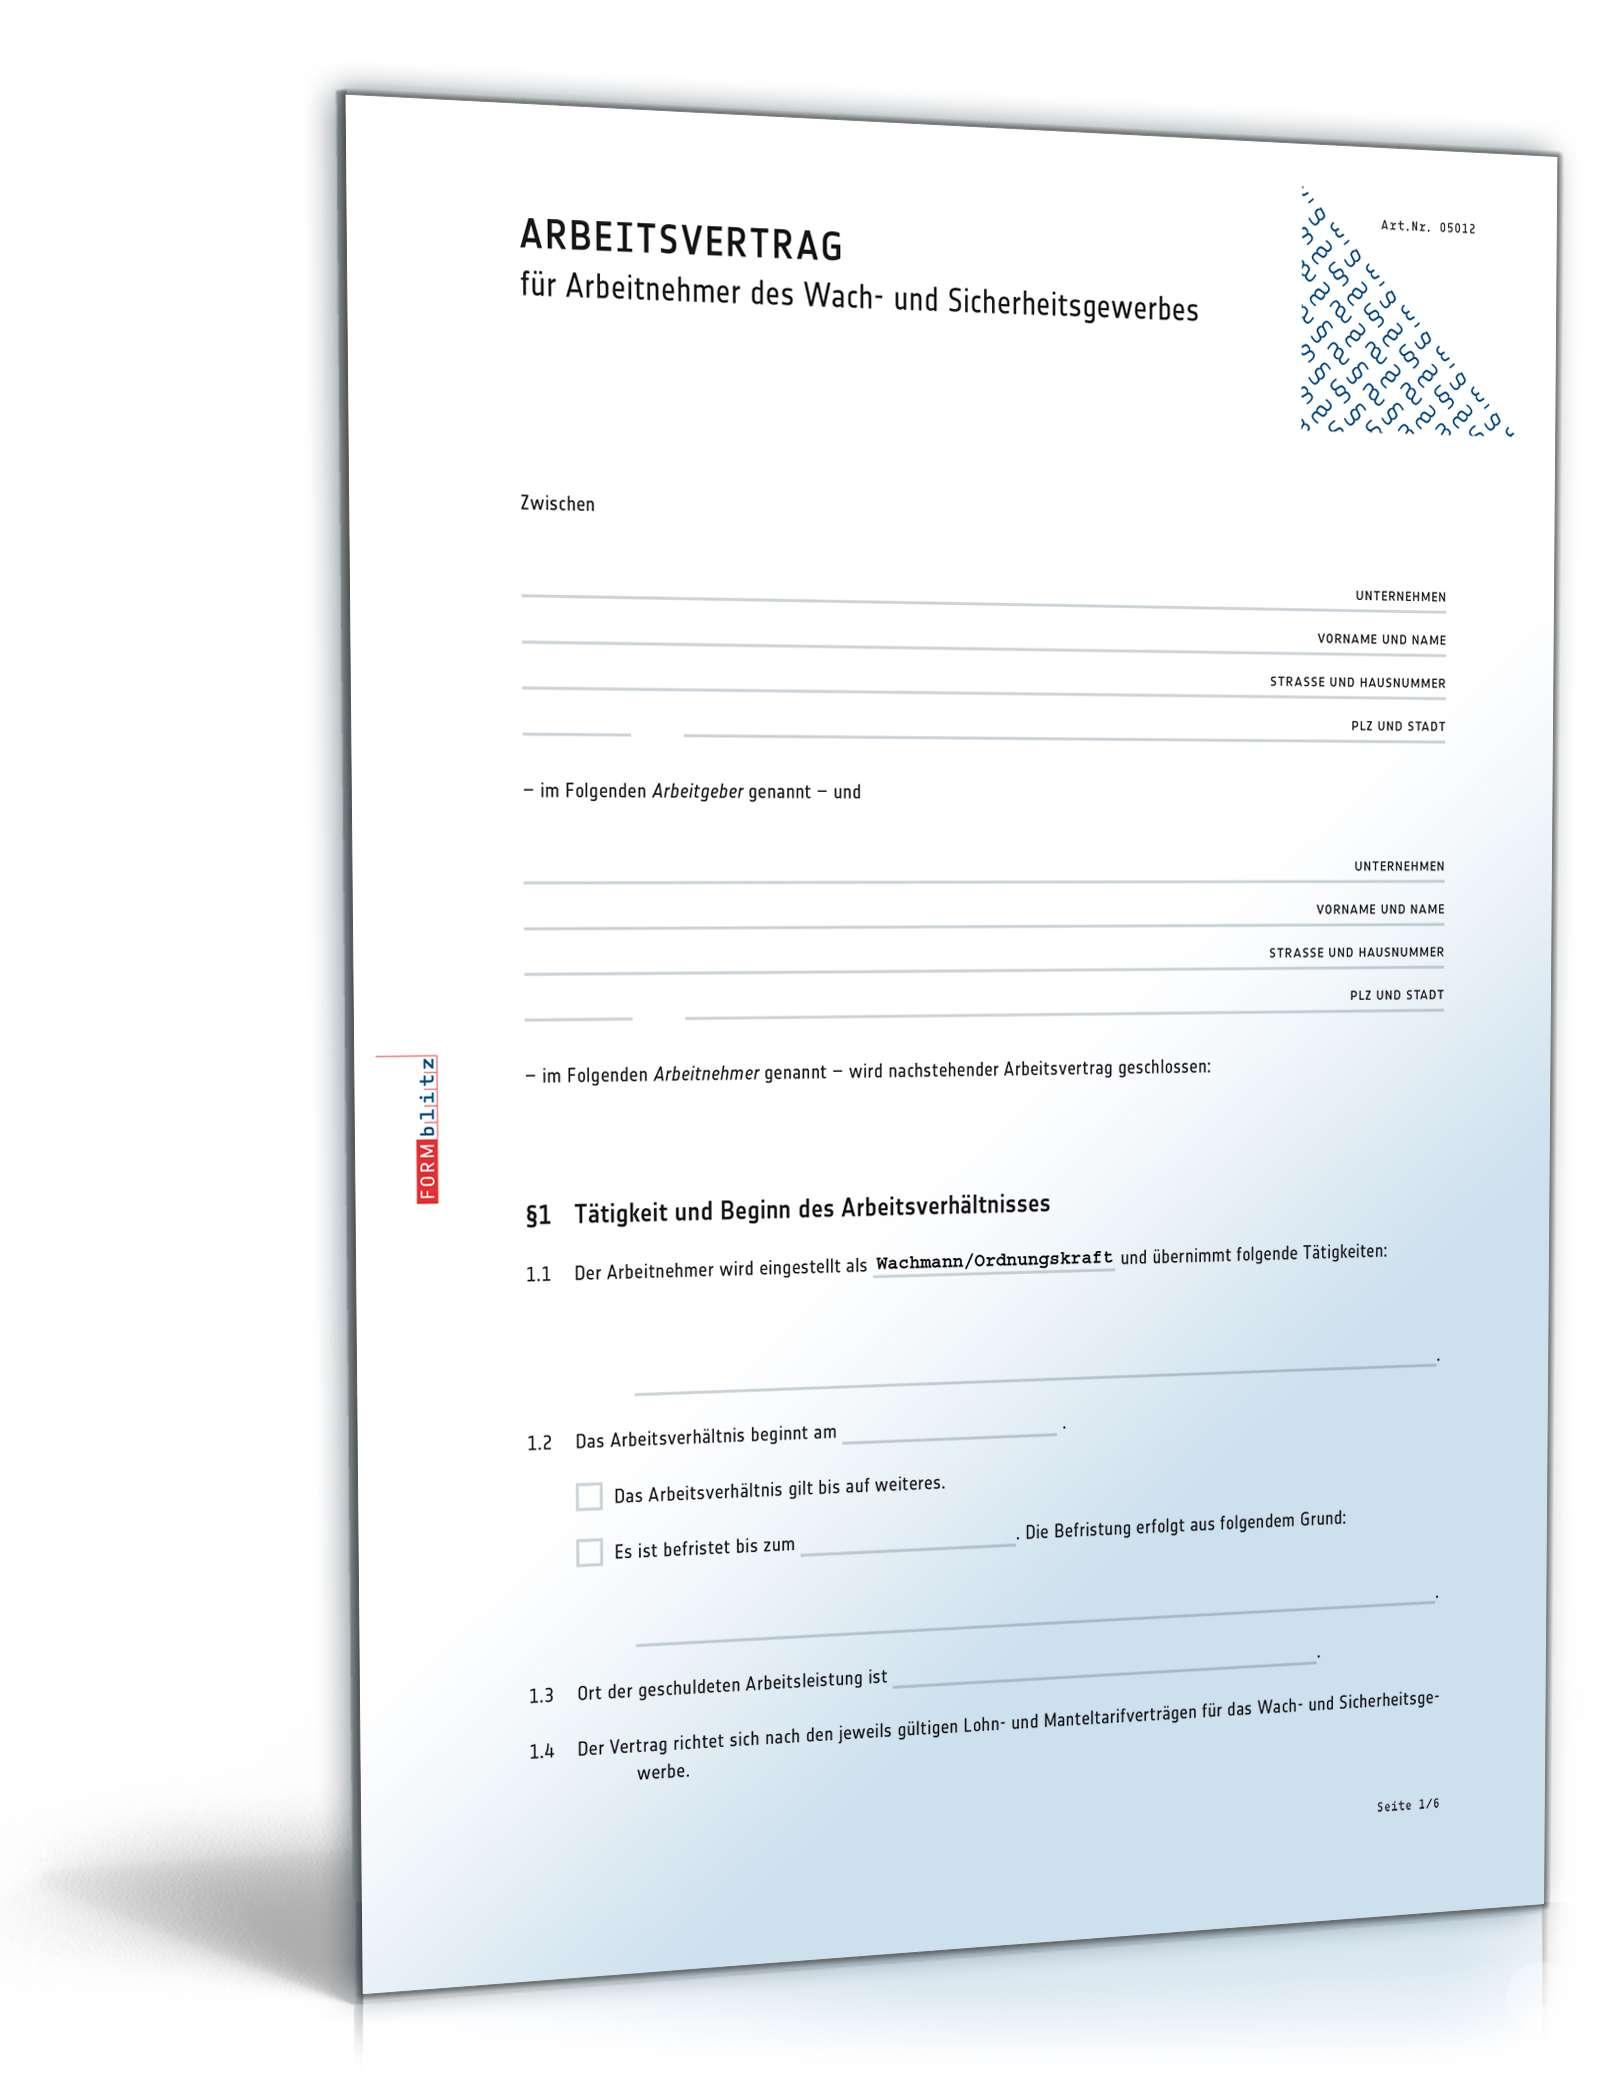 Arbeitsvertrag Bewachungsgewerbe Muster Zum Download